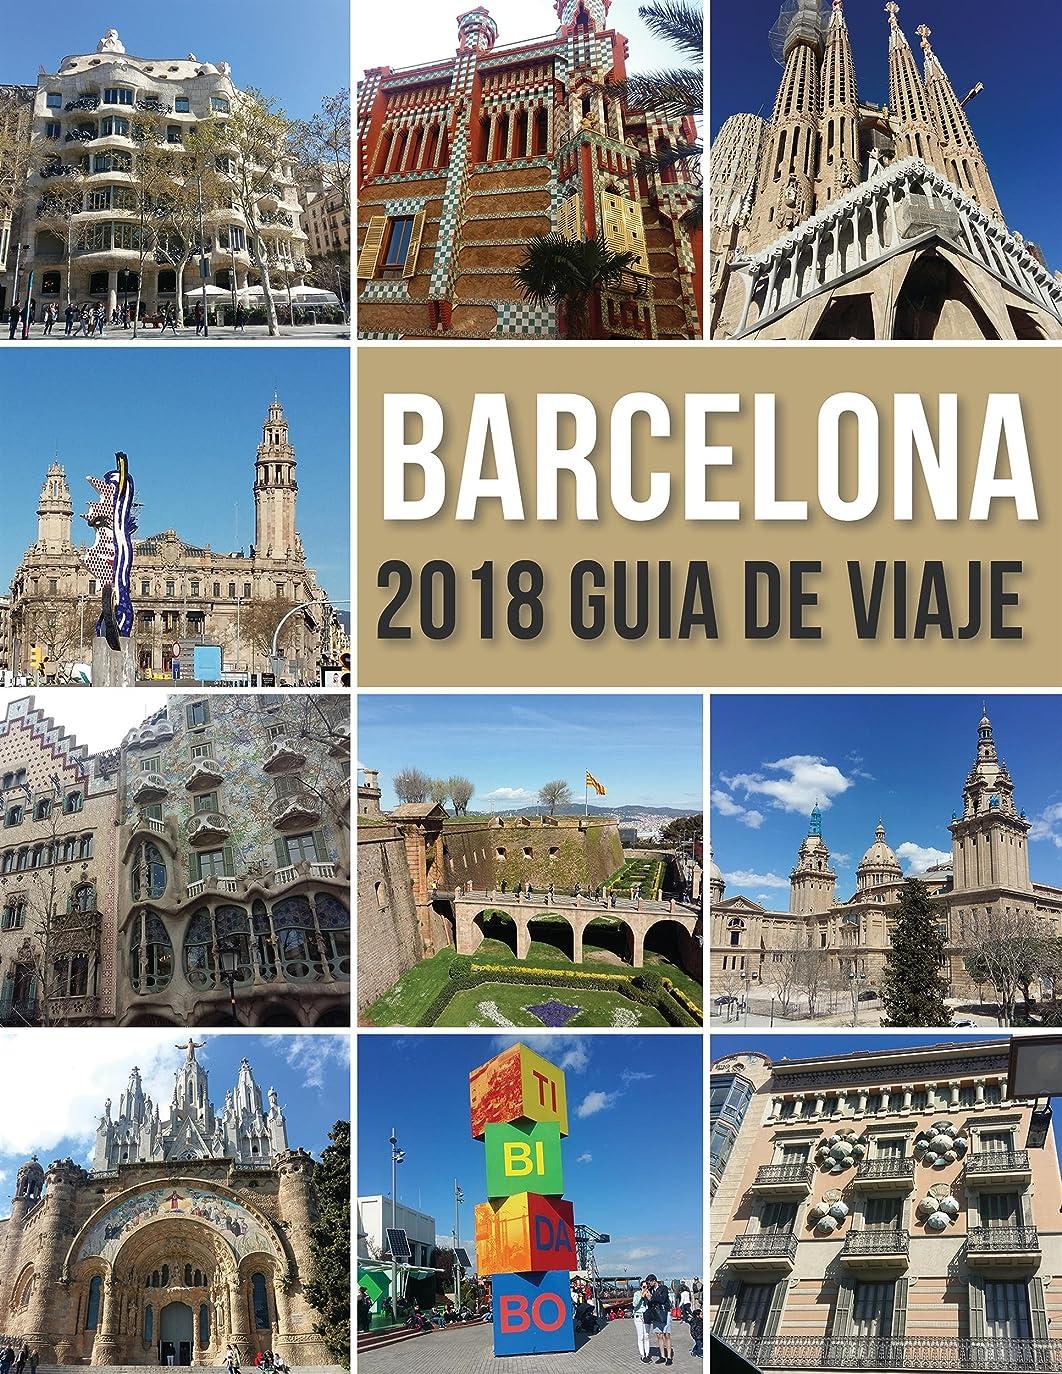 交響曲洗剤画家Barcelona 2018 Guia de Viaje: Bienvenido a Barcelona, la ciudad de Gaudí, y mucho más (Travel Guides) (Spanish Edition)